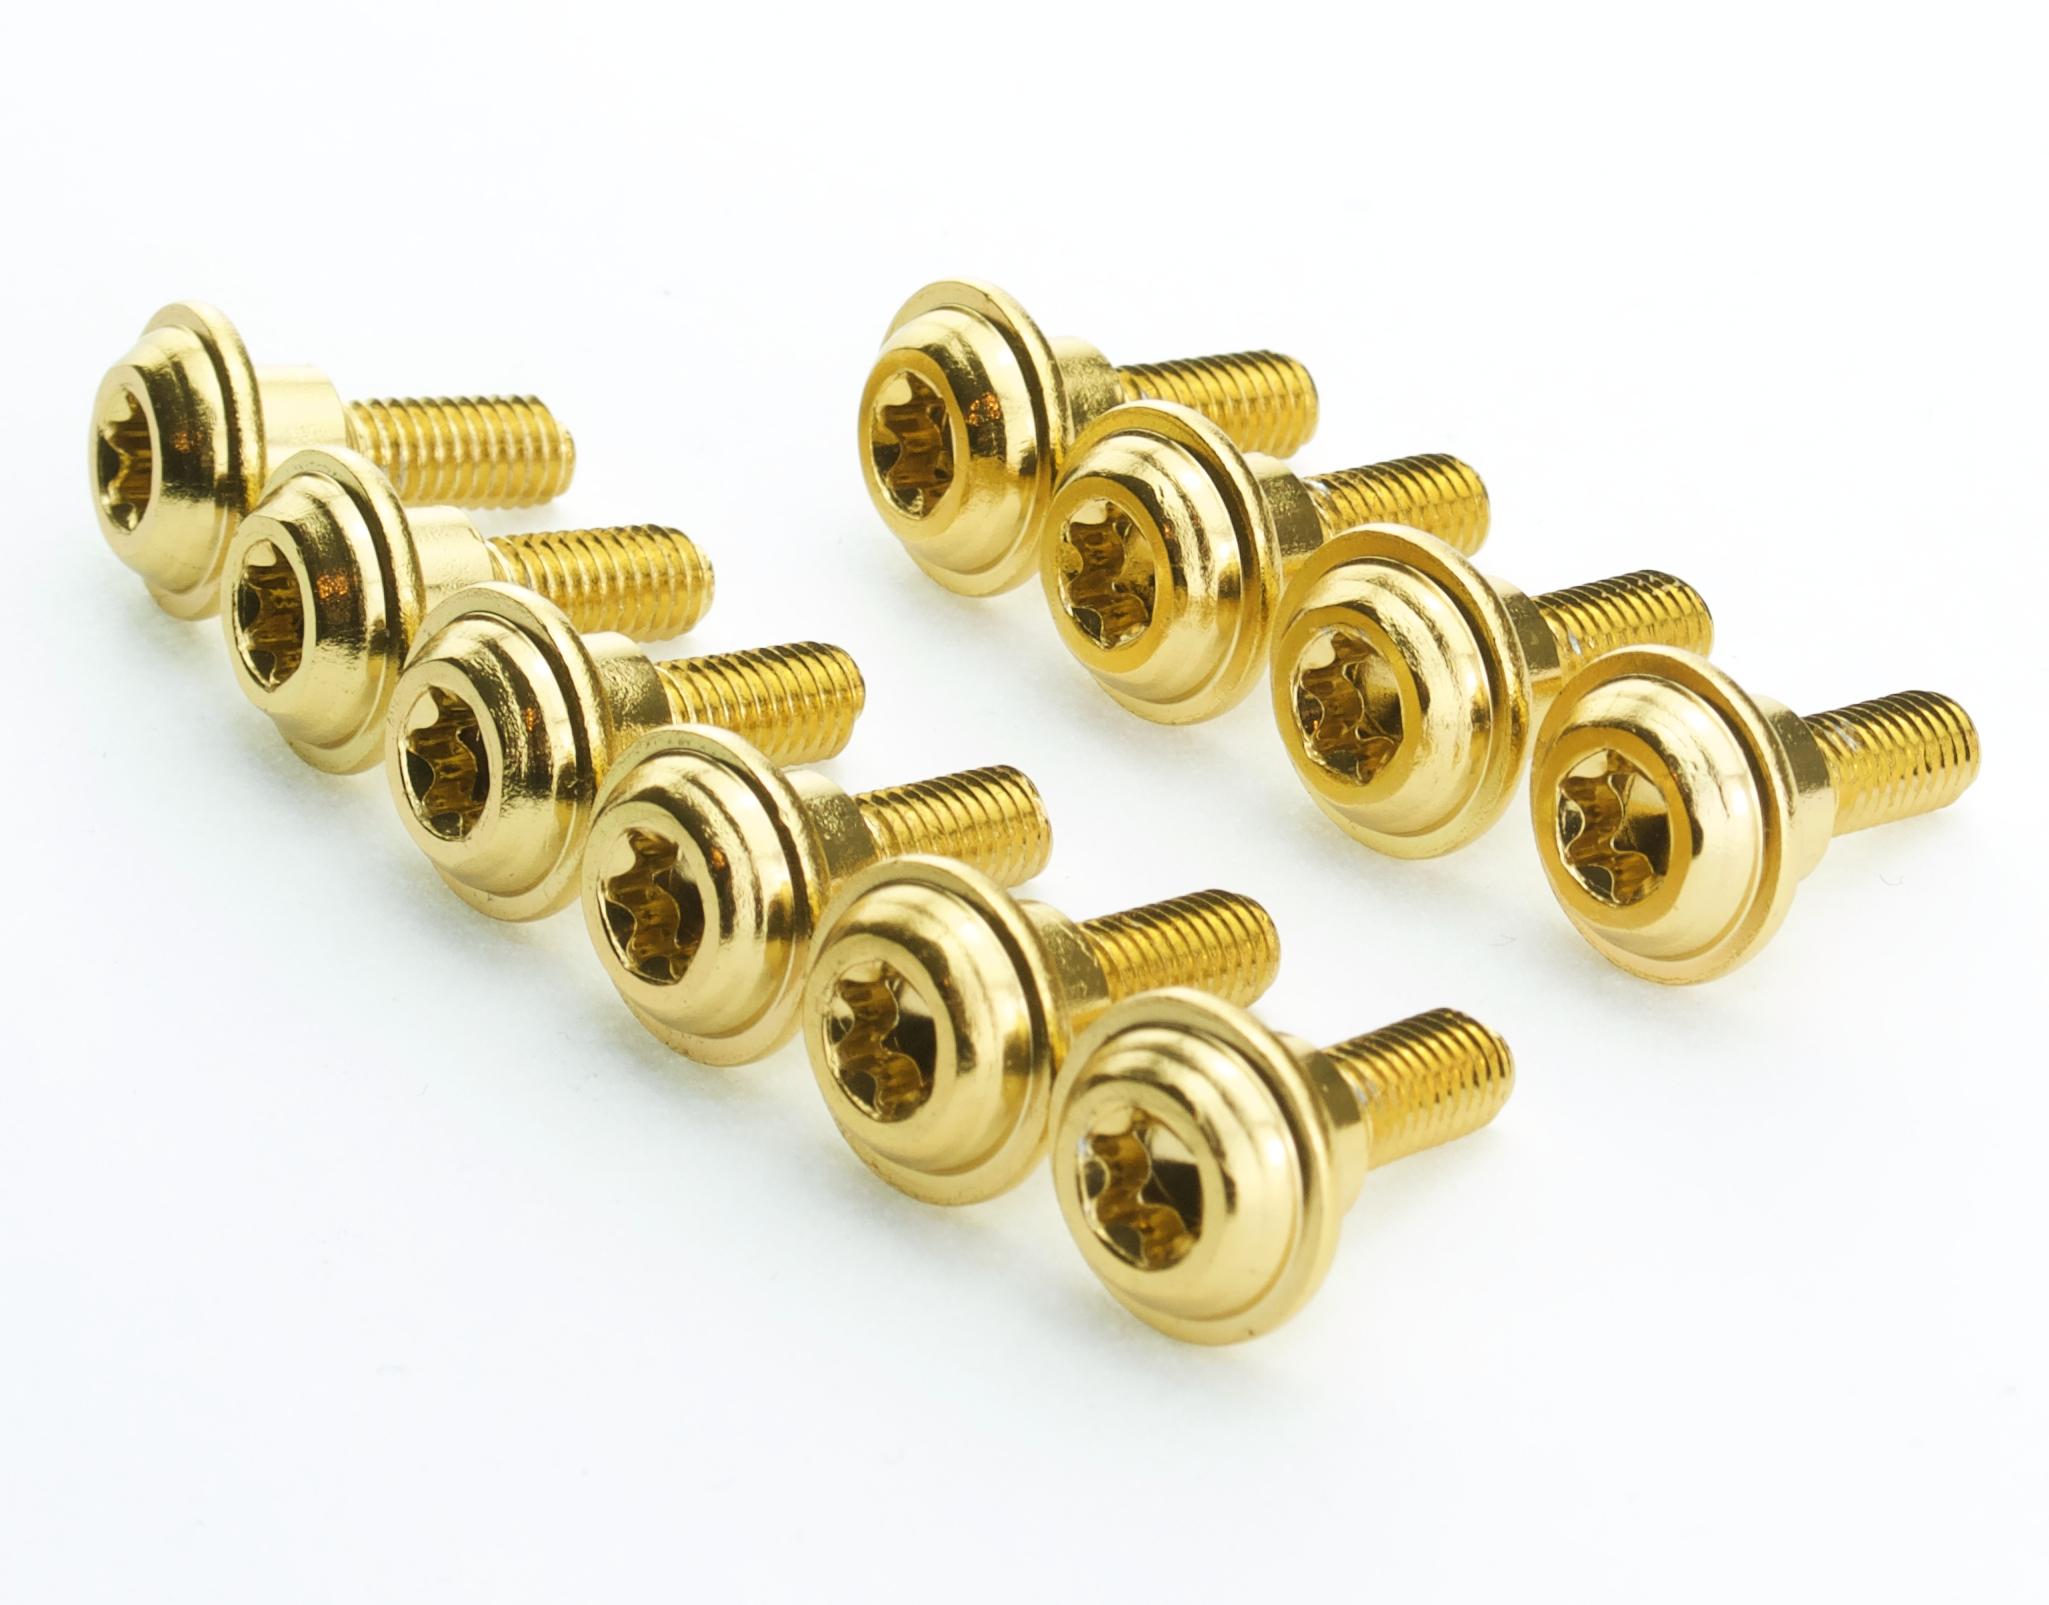 peugeot speedfight 2 ac lc schrauben verkleidung aluminium gold eloxiert 10er set motorrad. Black Bedroom Furniture Sets. Home Design Ideas